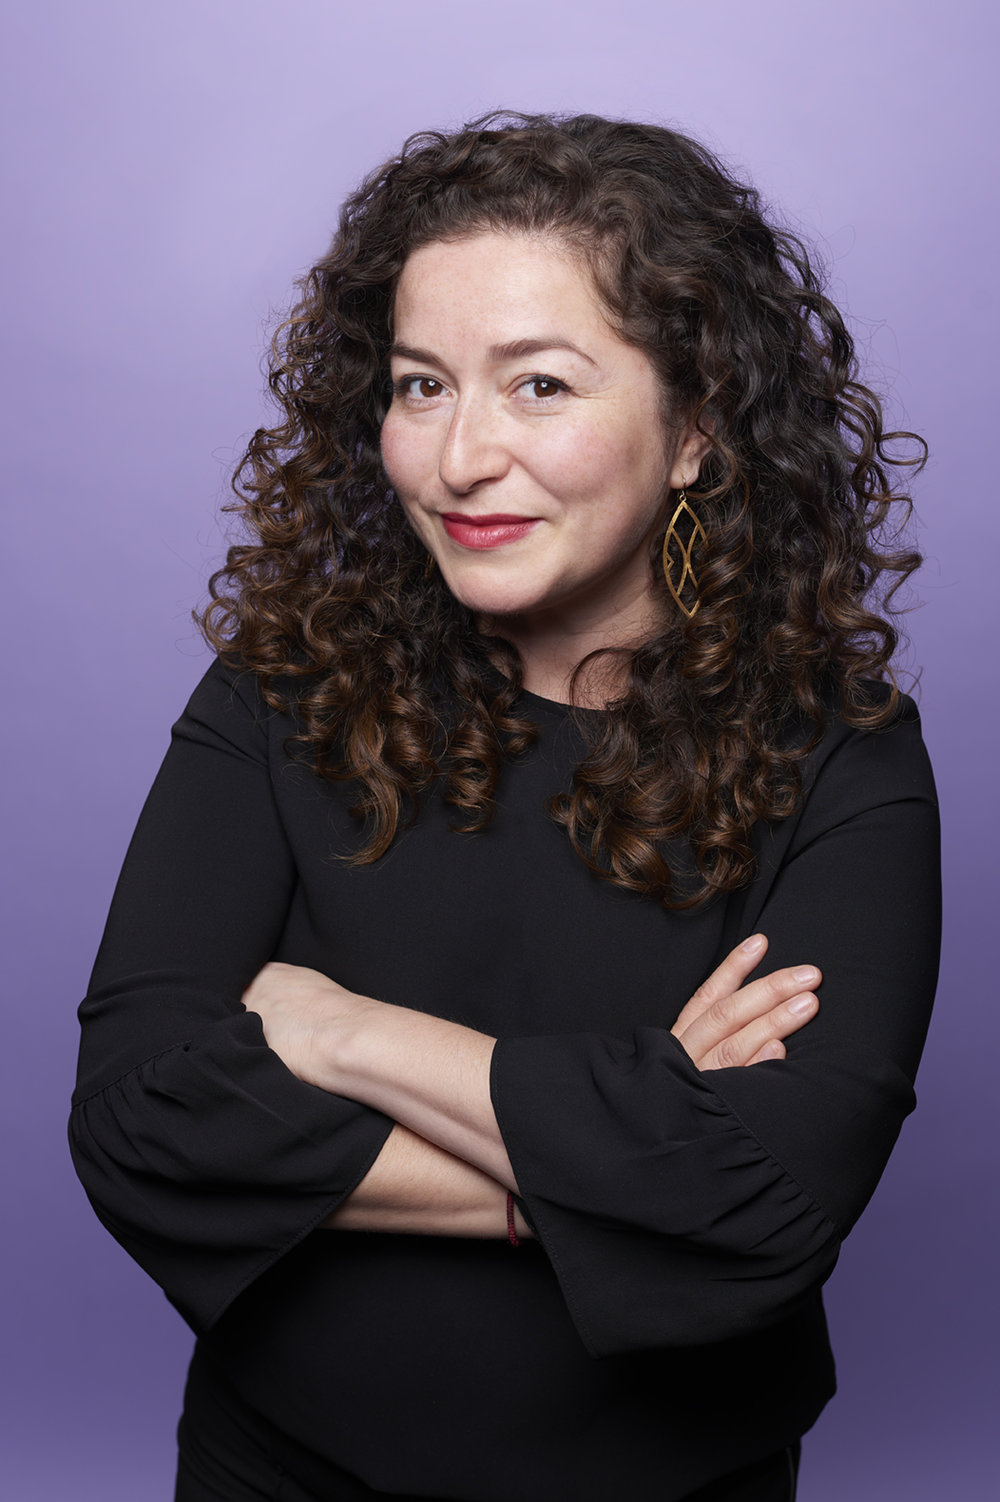 Sofia Hernandez - Chief Client Officer